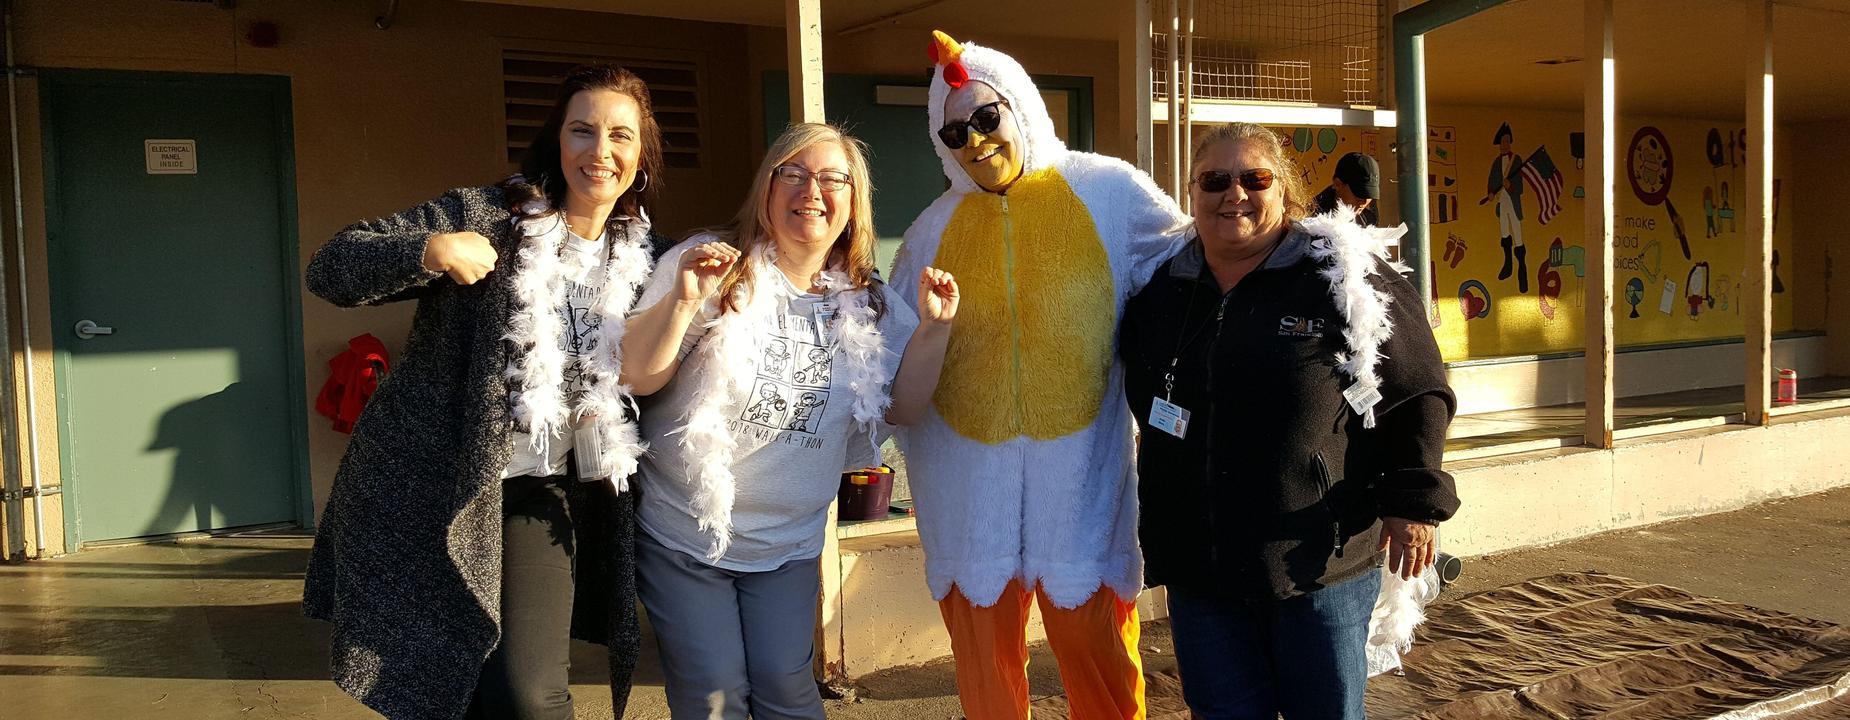 Staff showing their Proctor Pride!